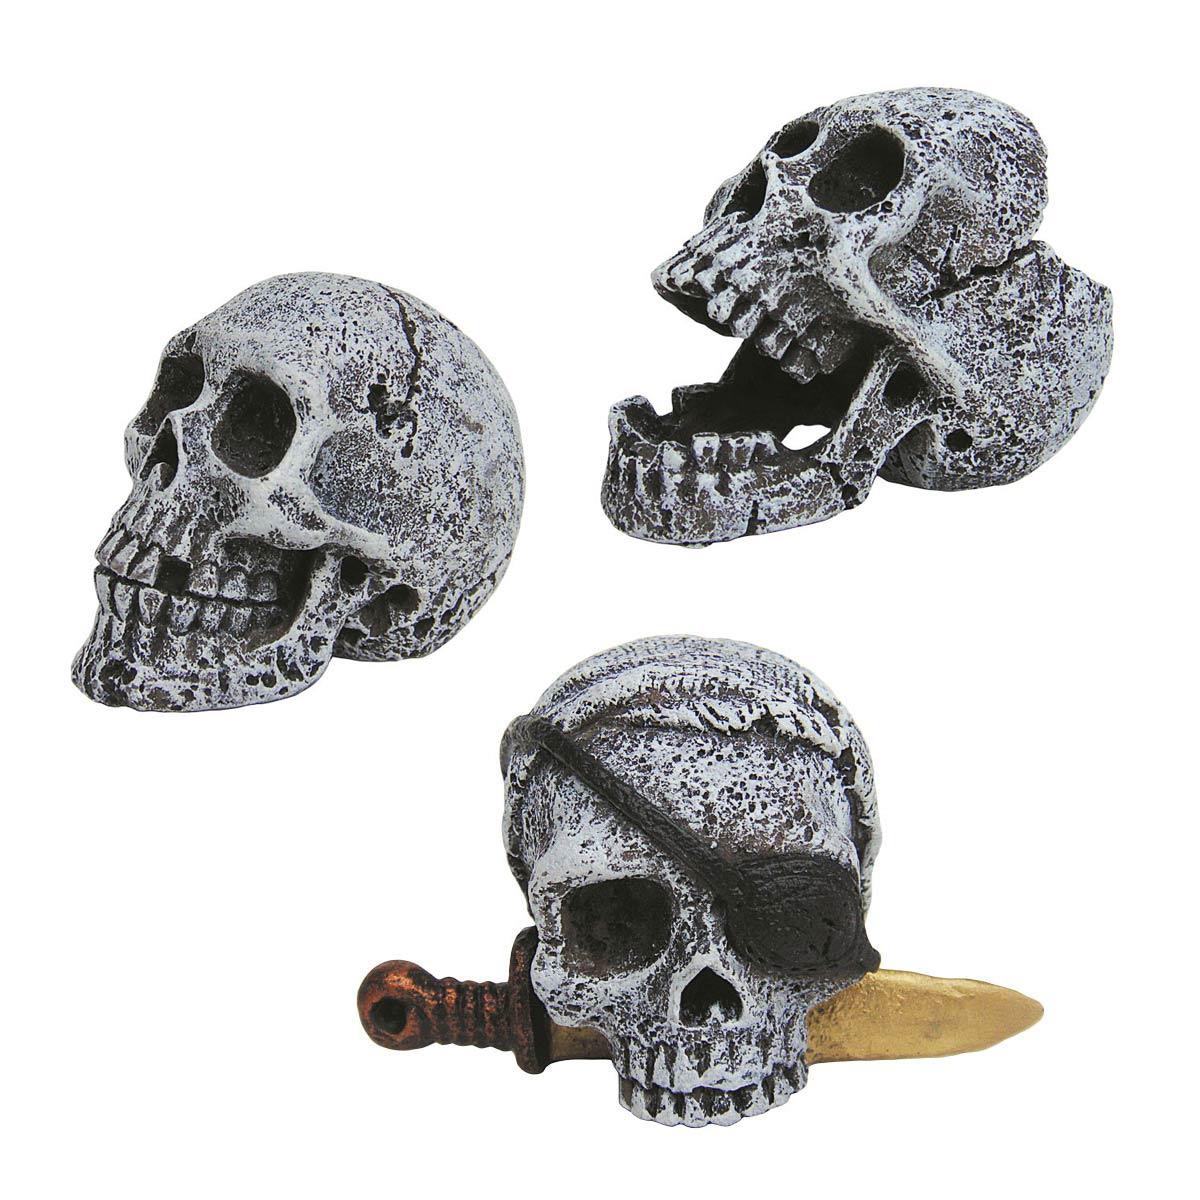 Nano Totenkopf Deko Gunstig Kaufen Im Naqua De Shop